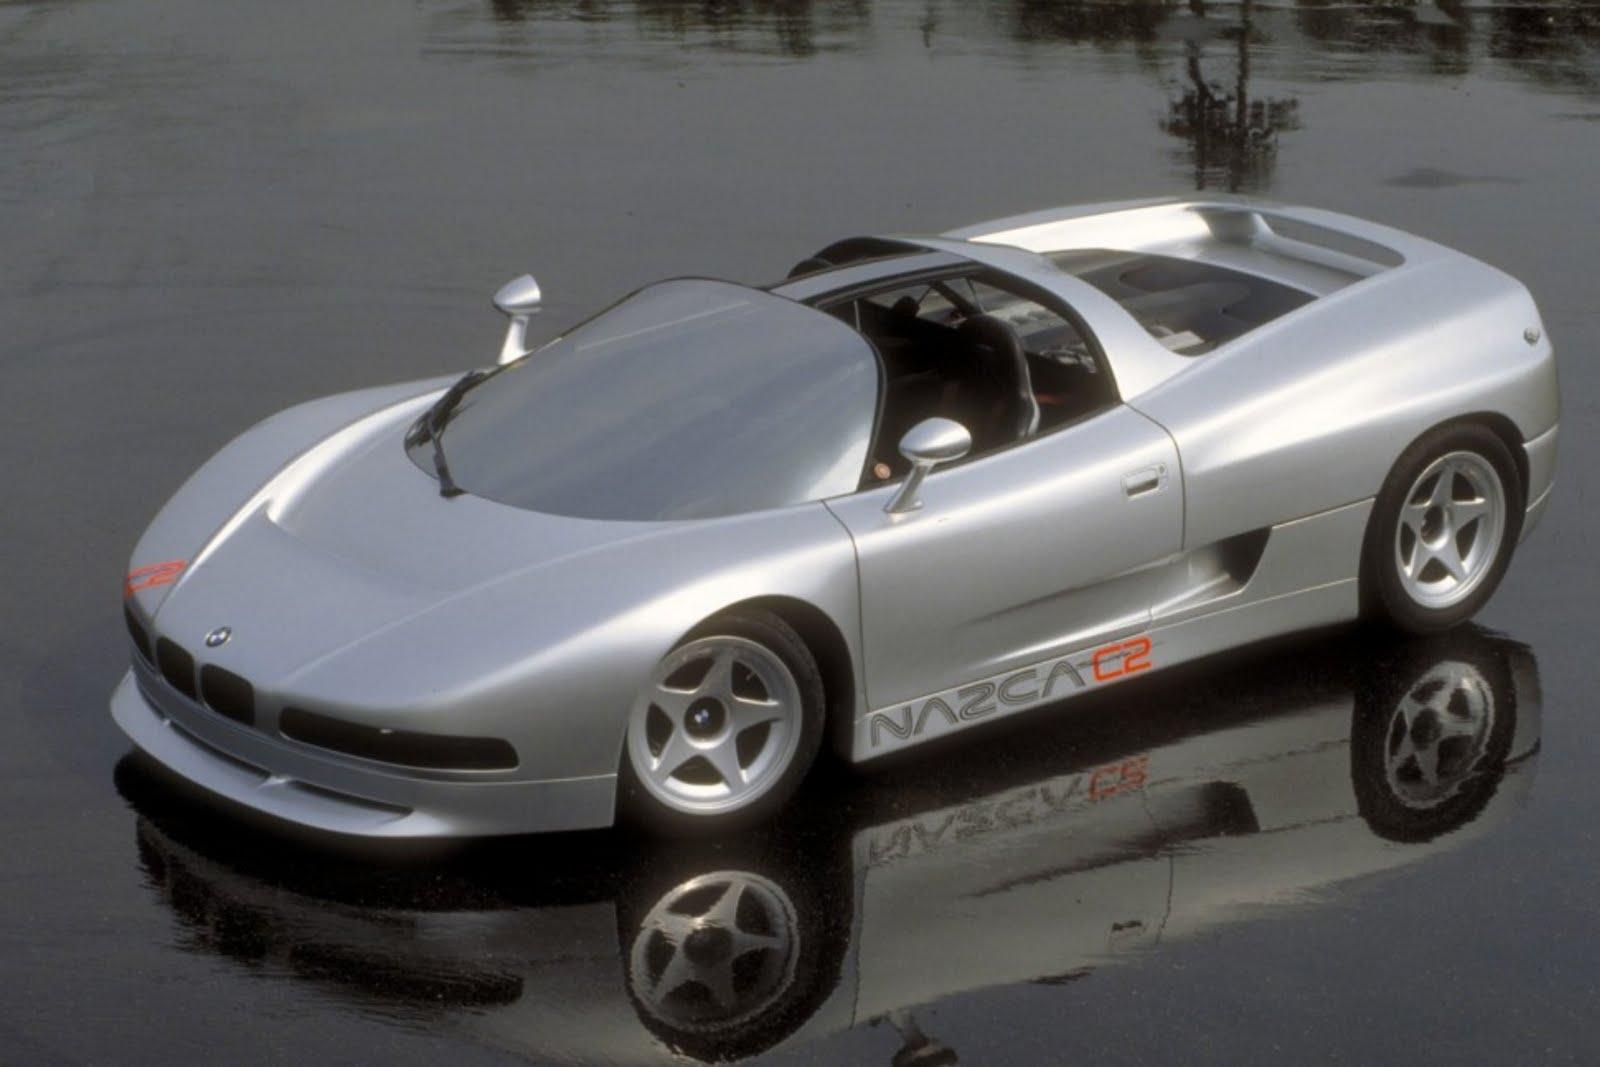 Bmw Nazca C2 Picture 4 Reviews News Specs Buy Car